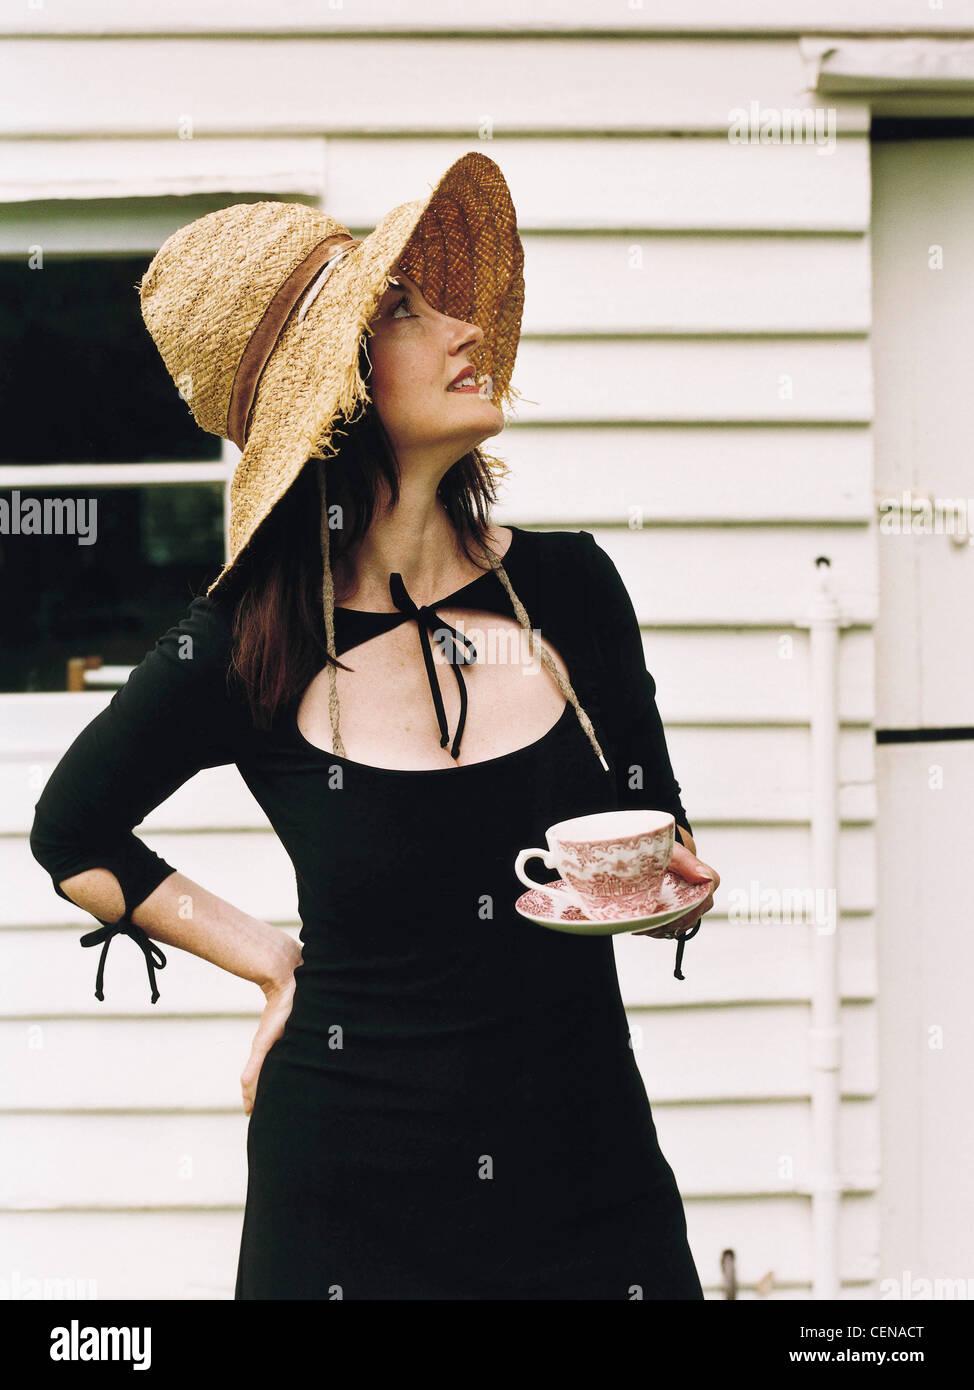 Leona Edmiston One Of Australias Most Successful Fashion Designers Stock Photo Alamy